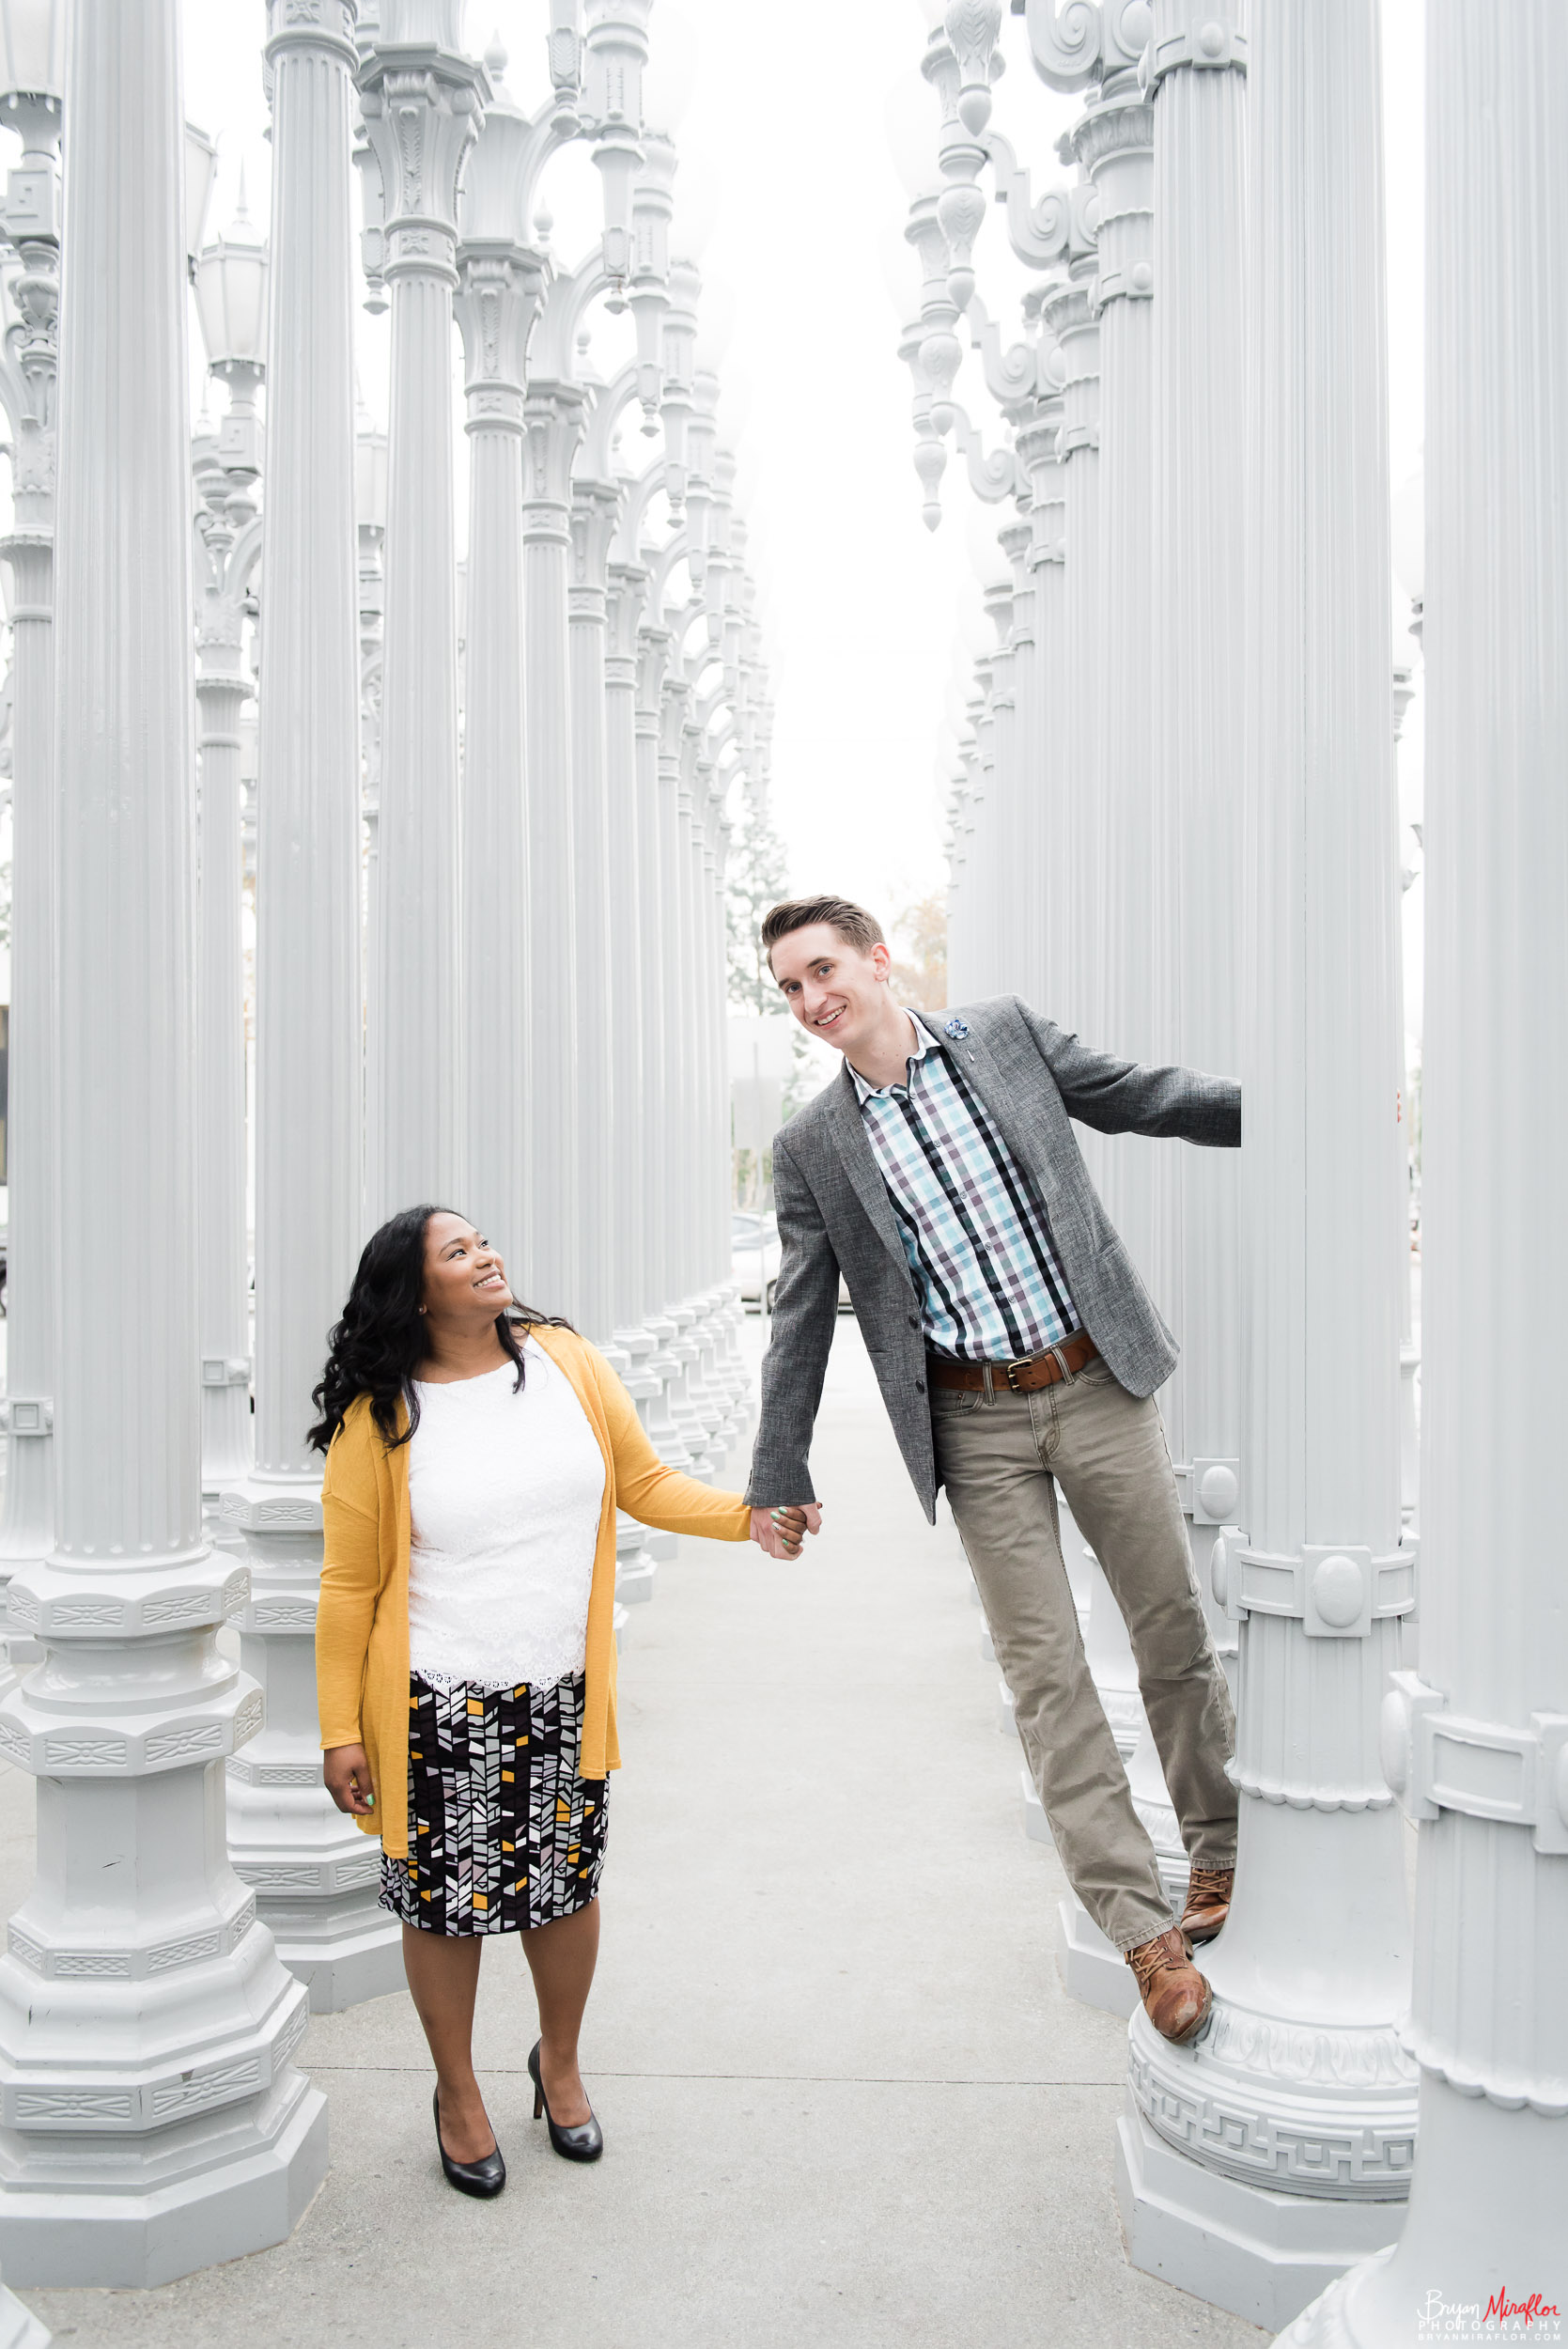 Bryan-Miraflor-Photography-Vanessa-Tommy-LACMA-DTLA-Engagement-Photoshoot-20161210-97.jpg